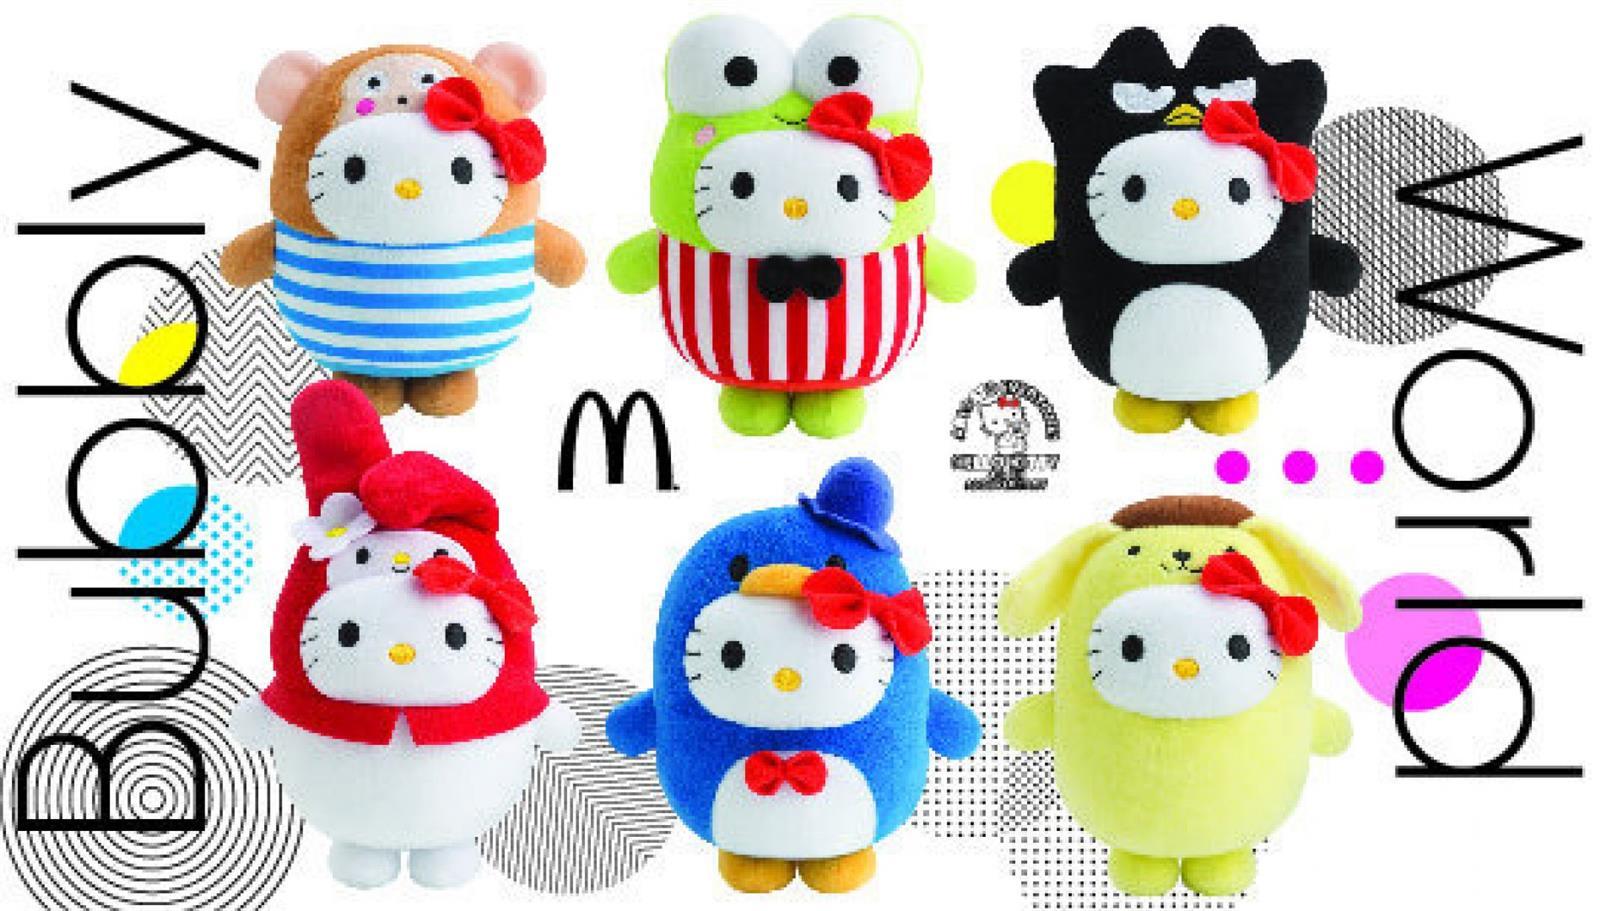 McDonald's Hello Kitty Bubbly World Collector's set